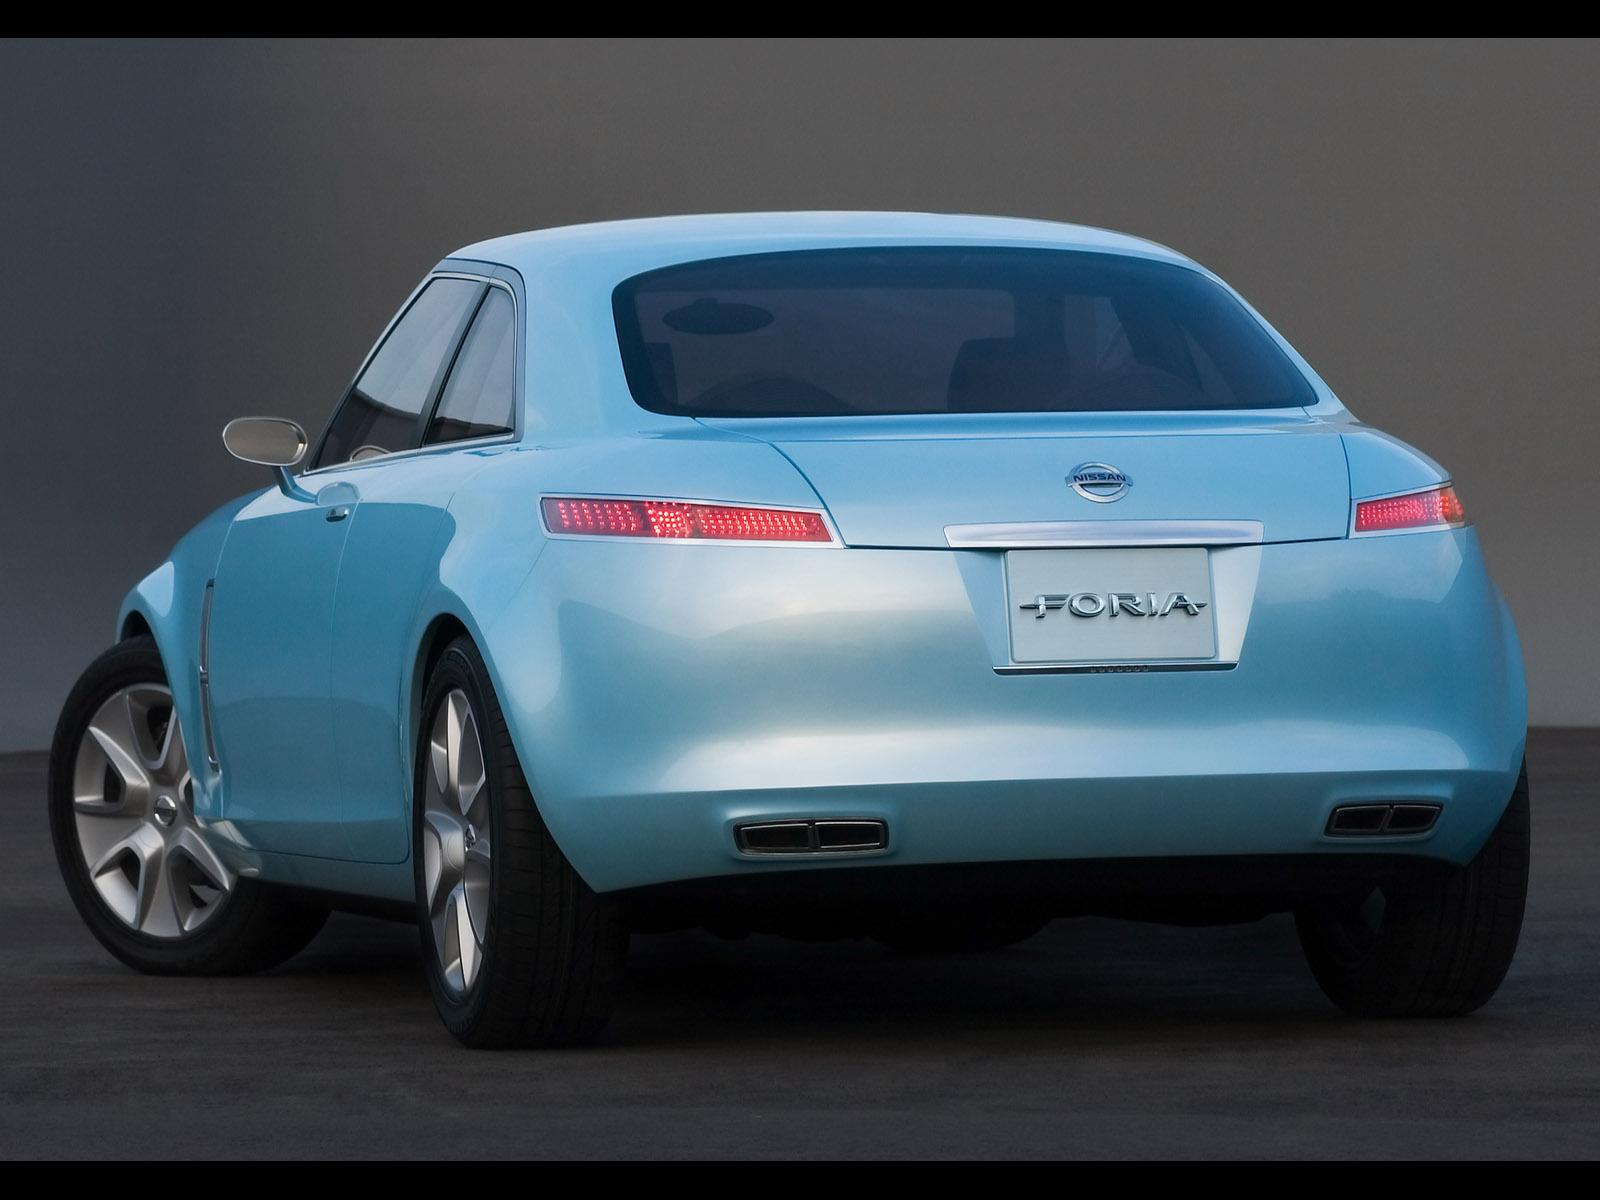 Nissan Foria photo 34500